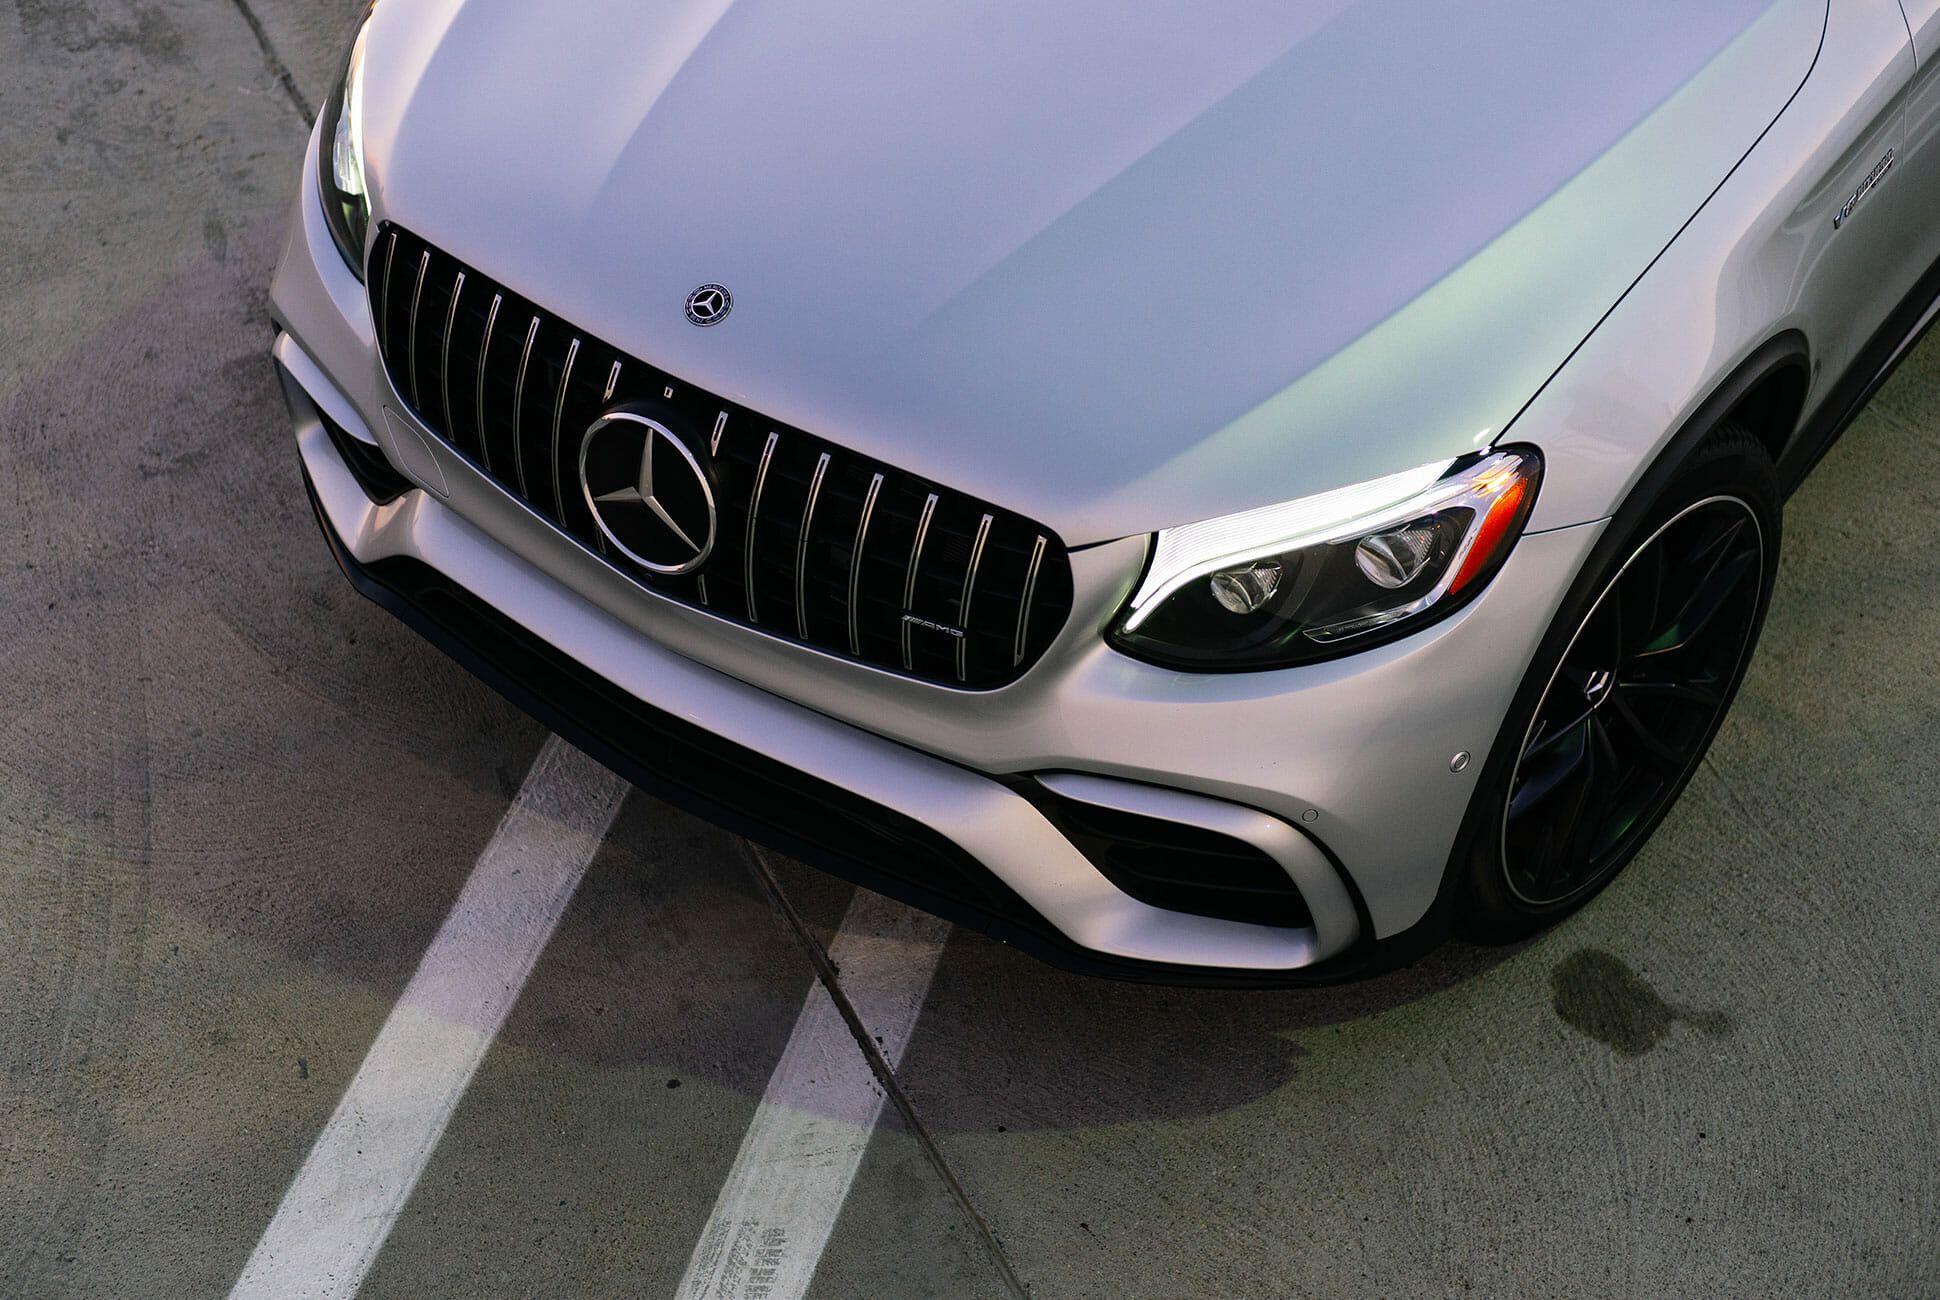 Mercedes-AMG-GLC-63-S-Review-gear-patrol-slide-3